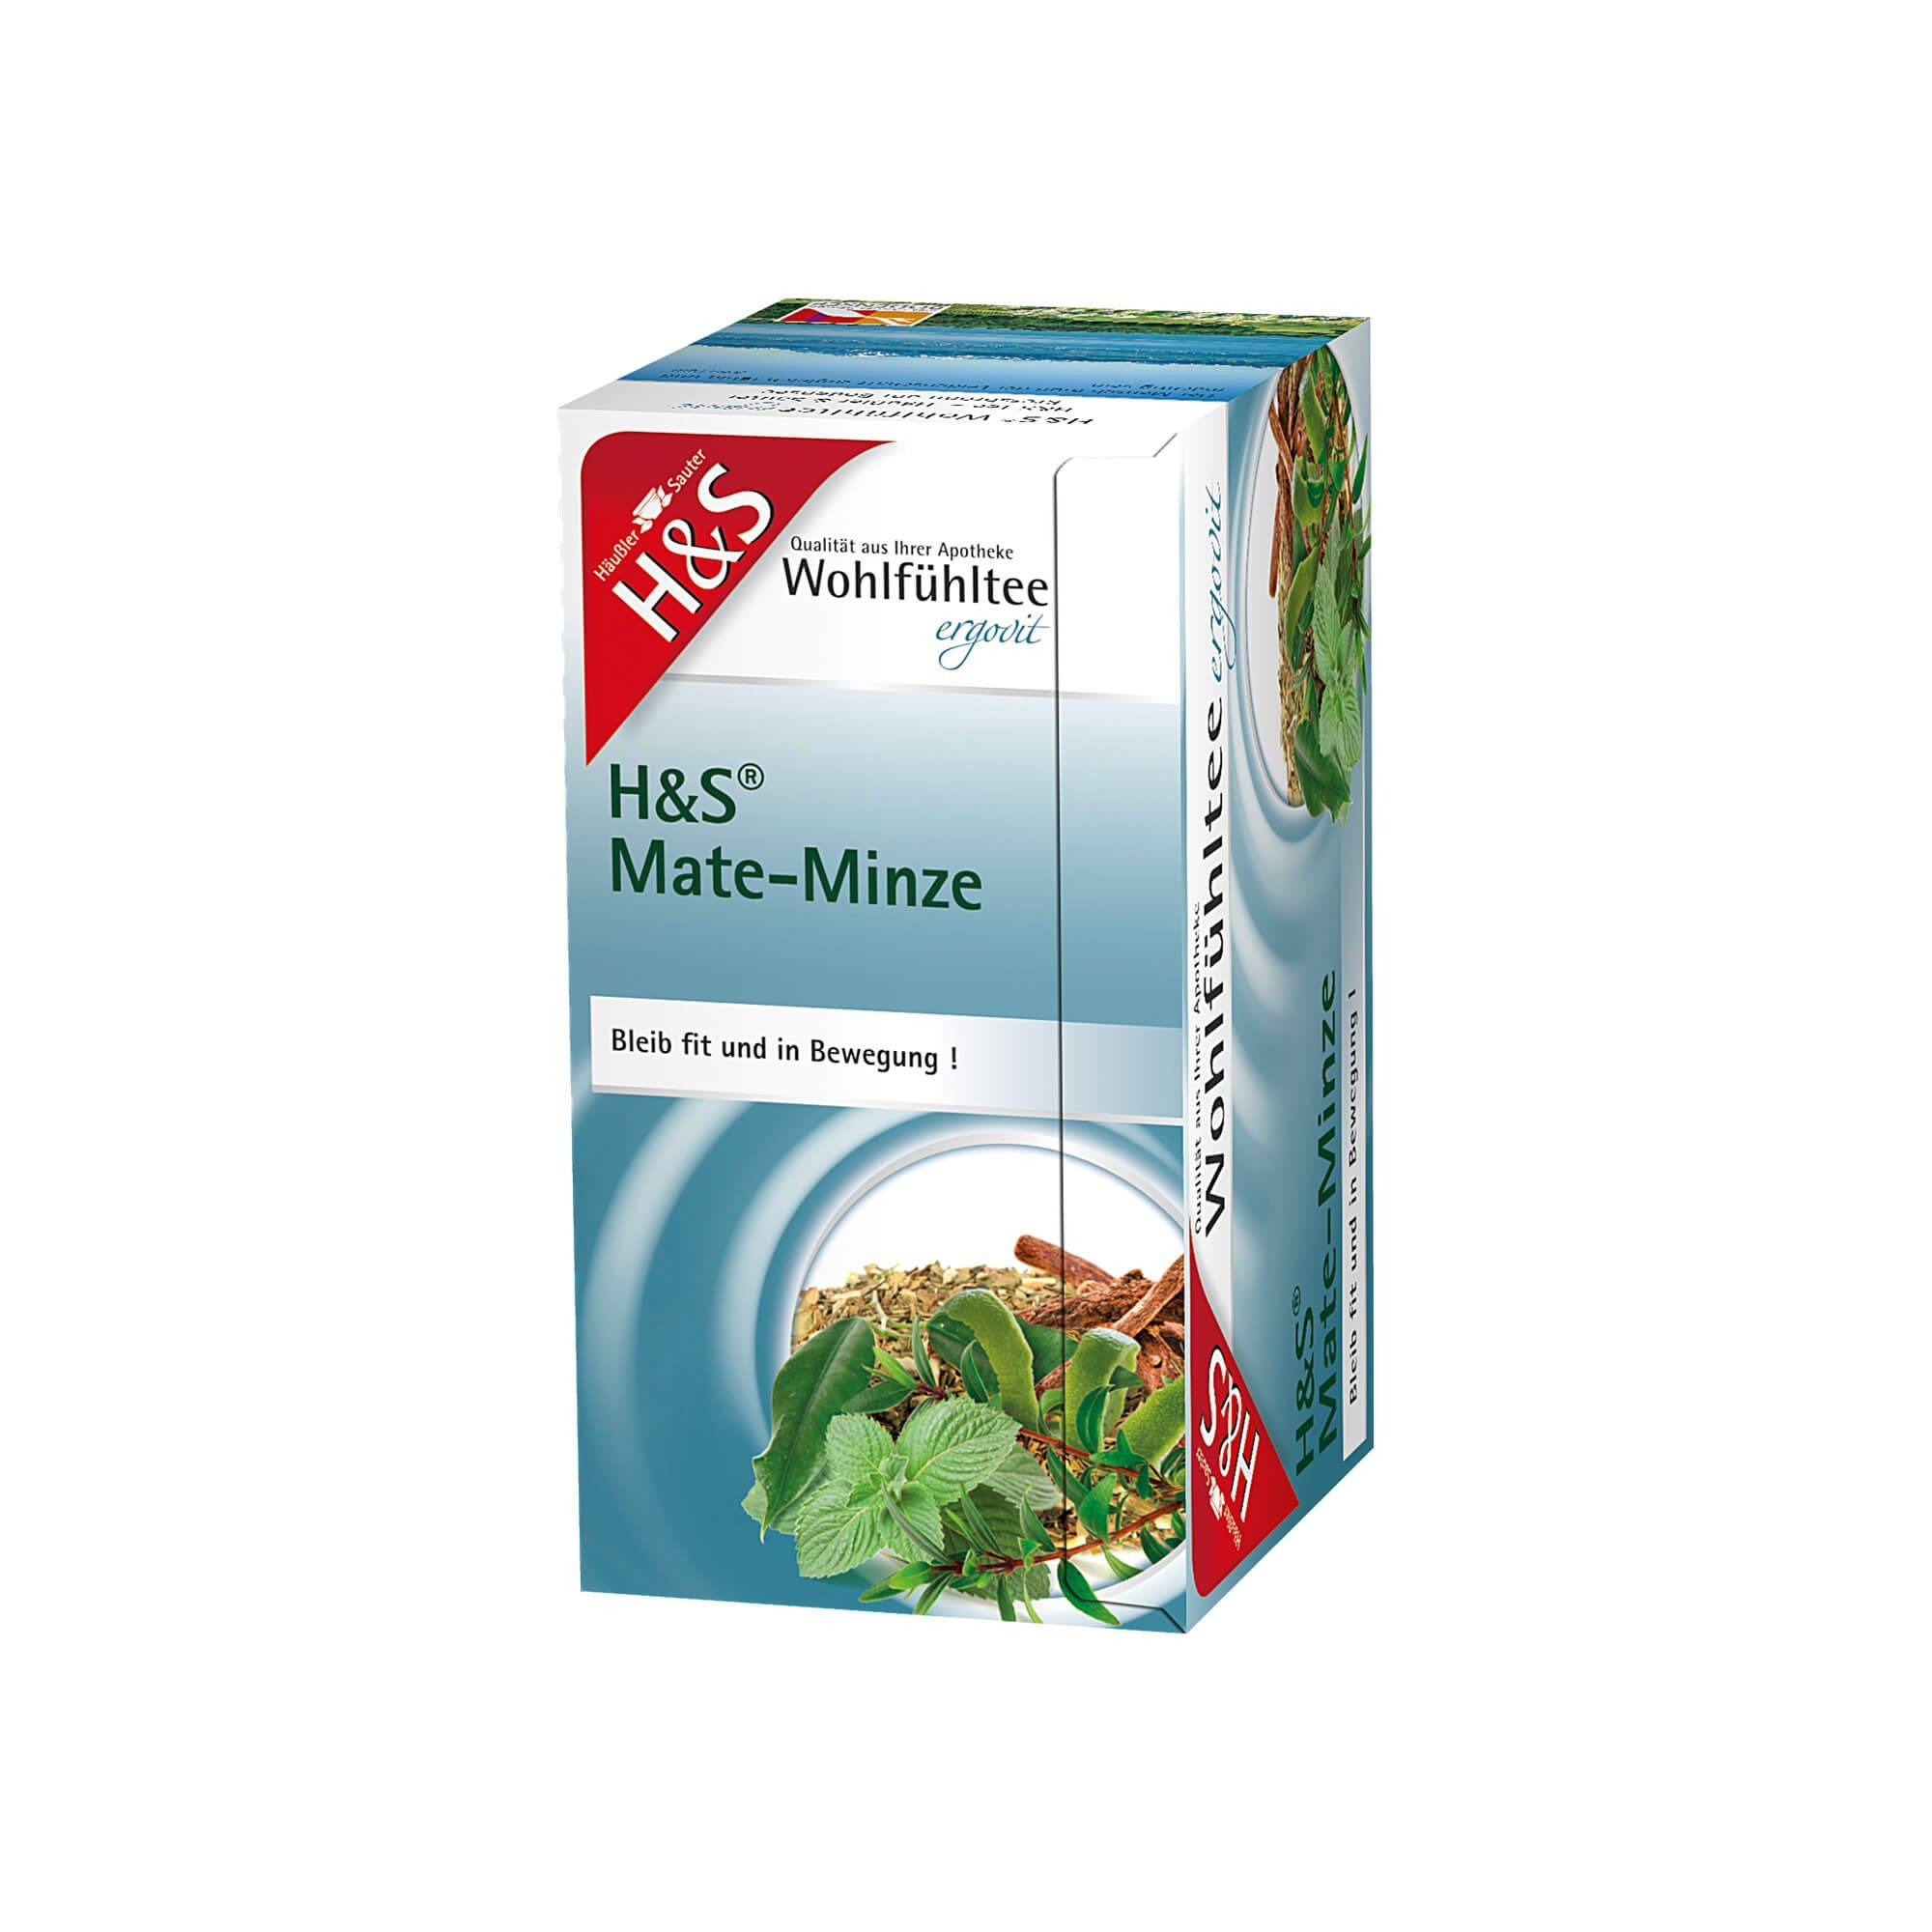 H&S Mate-Minze Filterbeutel , 20 St